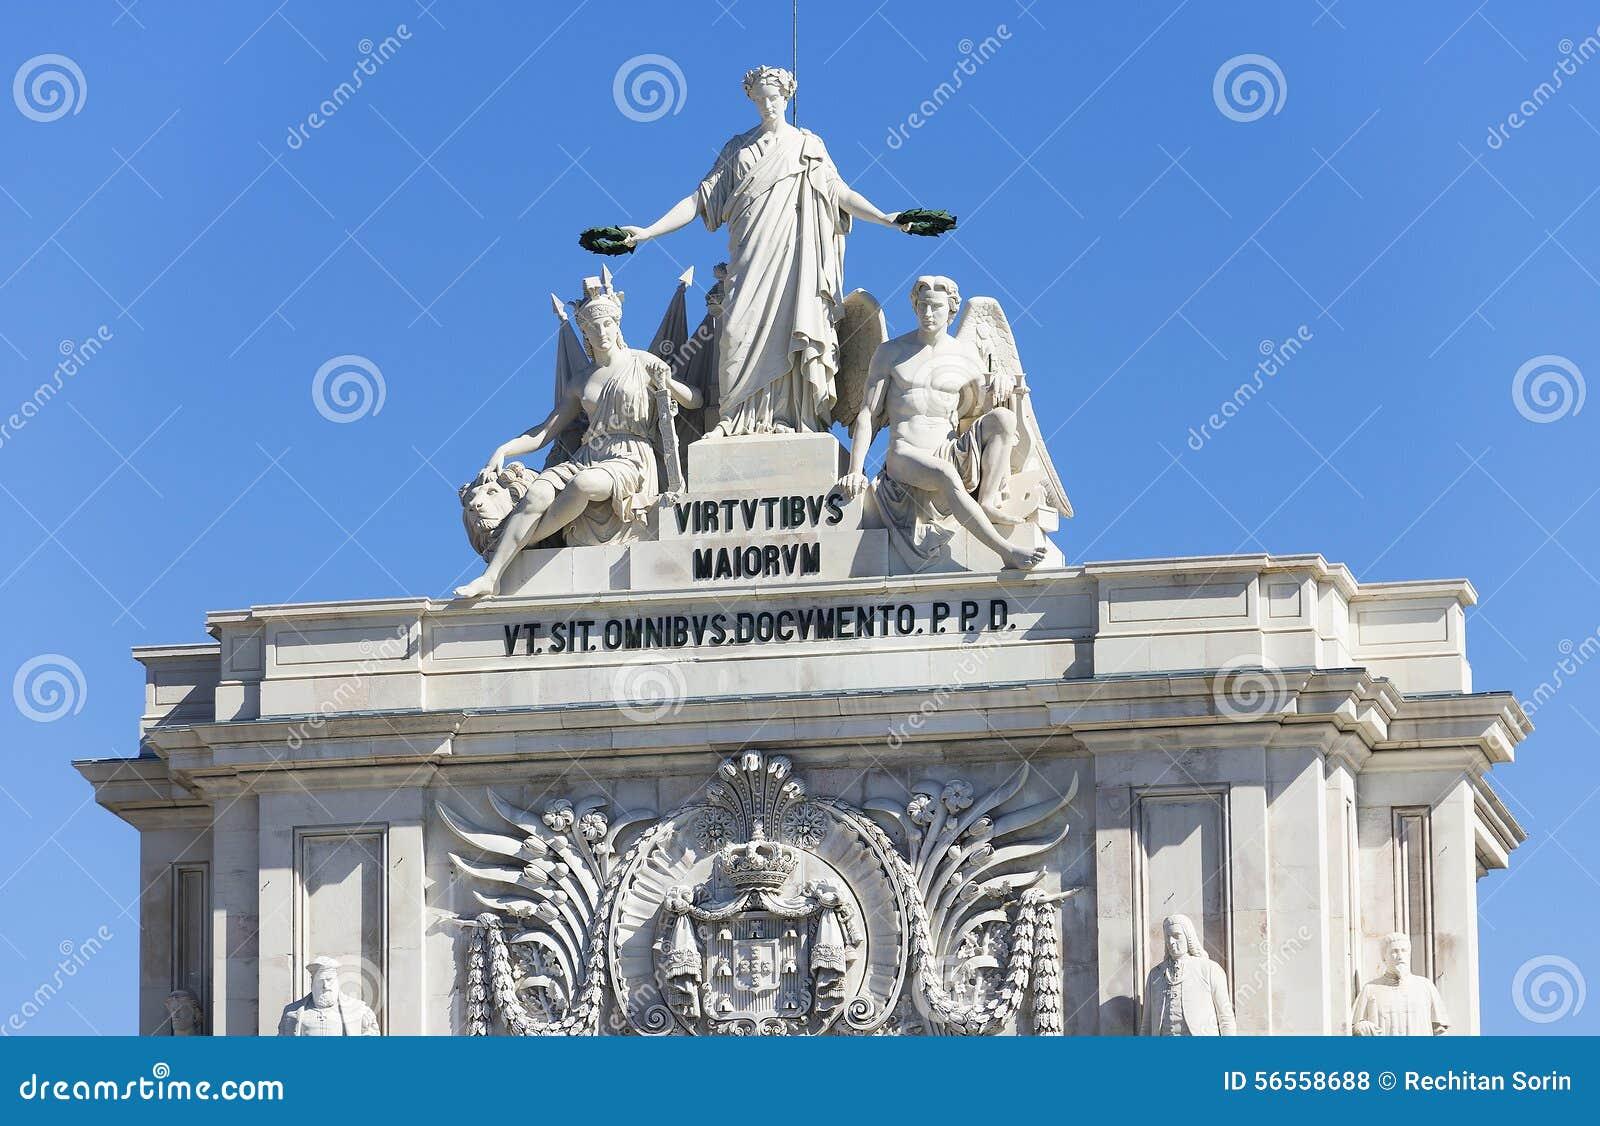 Download Αρχιτεκτονική λεπτομέρεια στη Λισσαβώνα Στοκ Εικόνες - εικόνα από μνημείο, αρχιτεκτονικής: 56558688